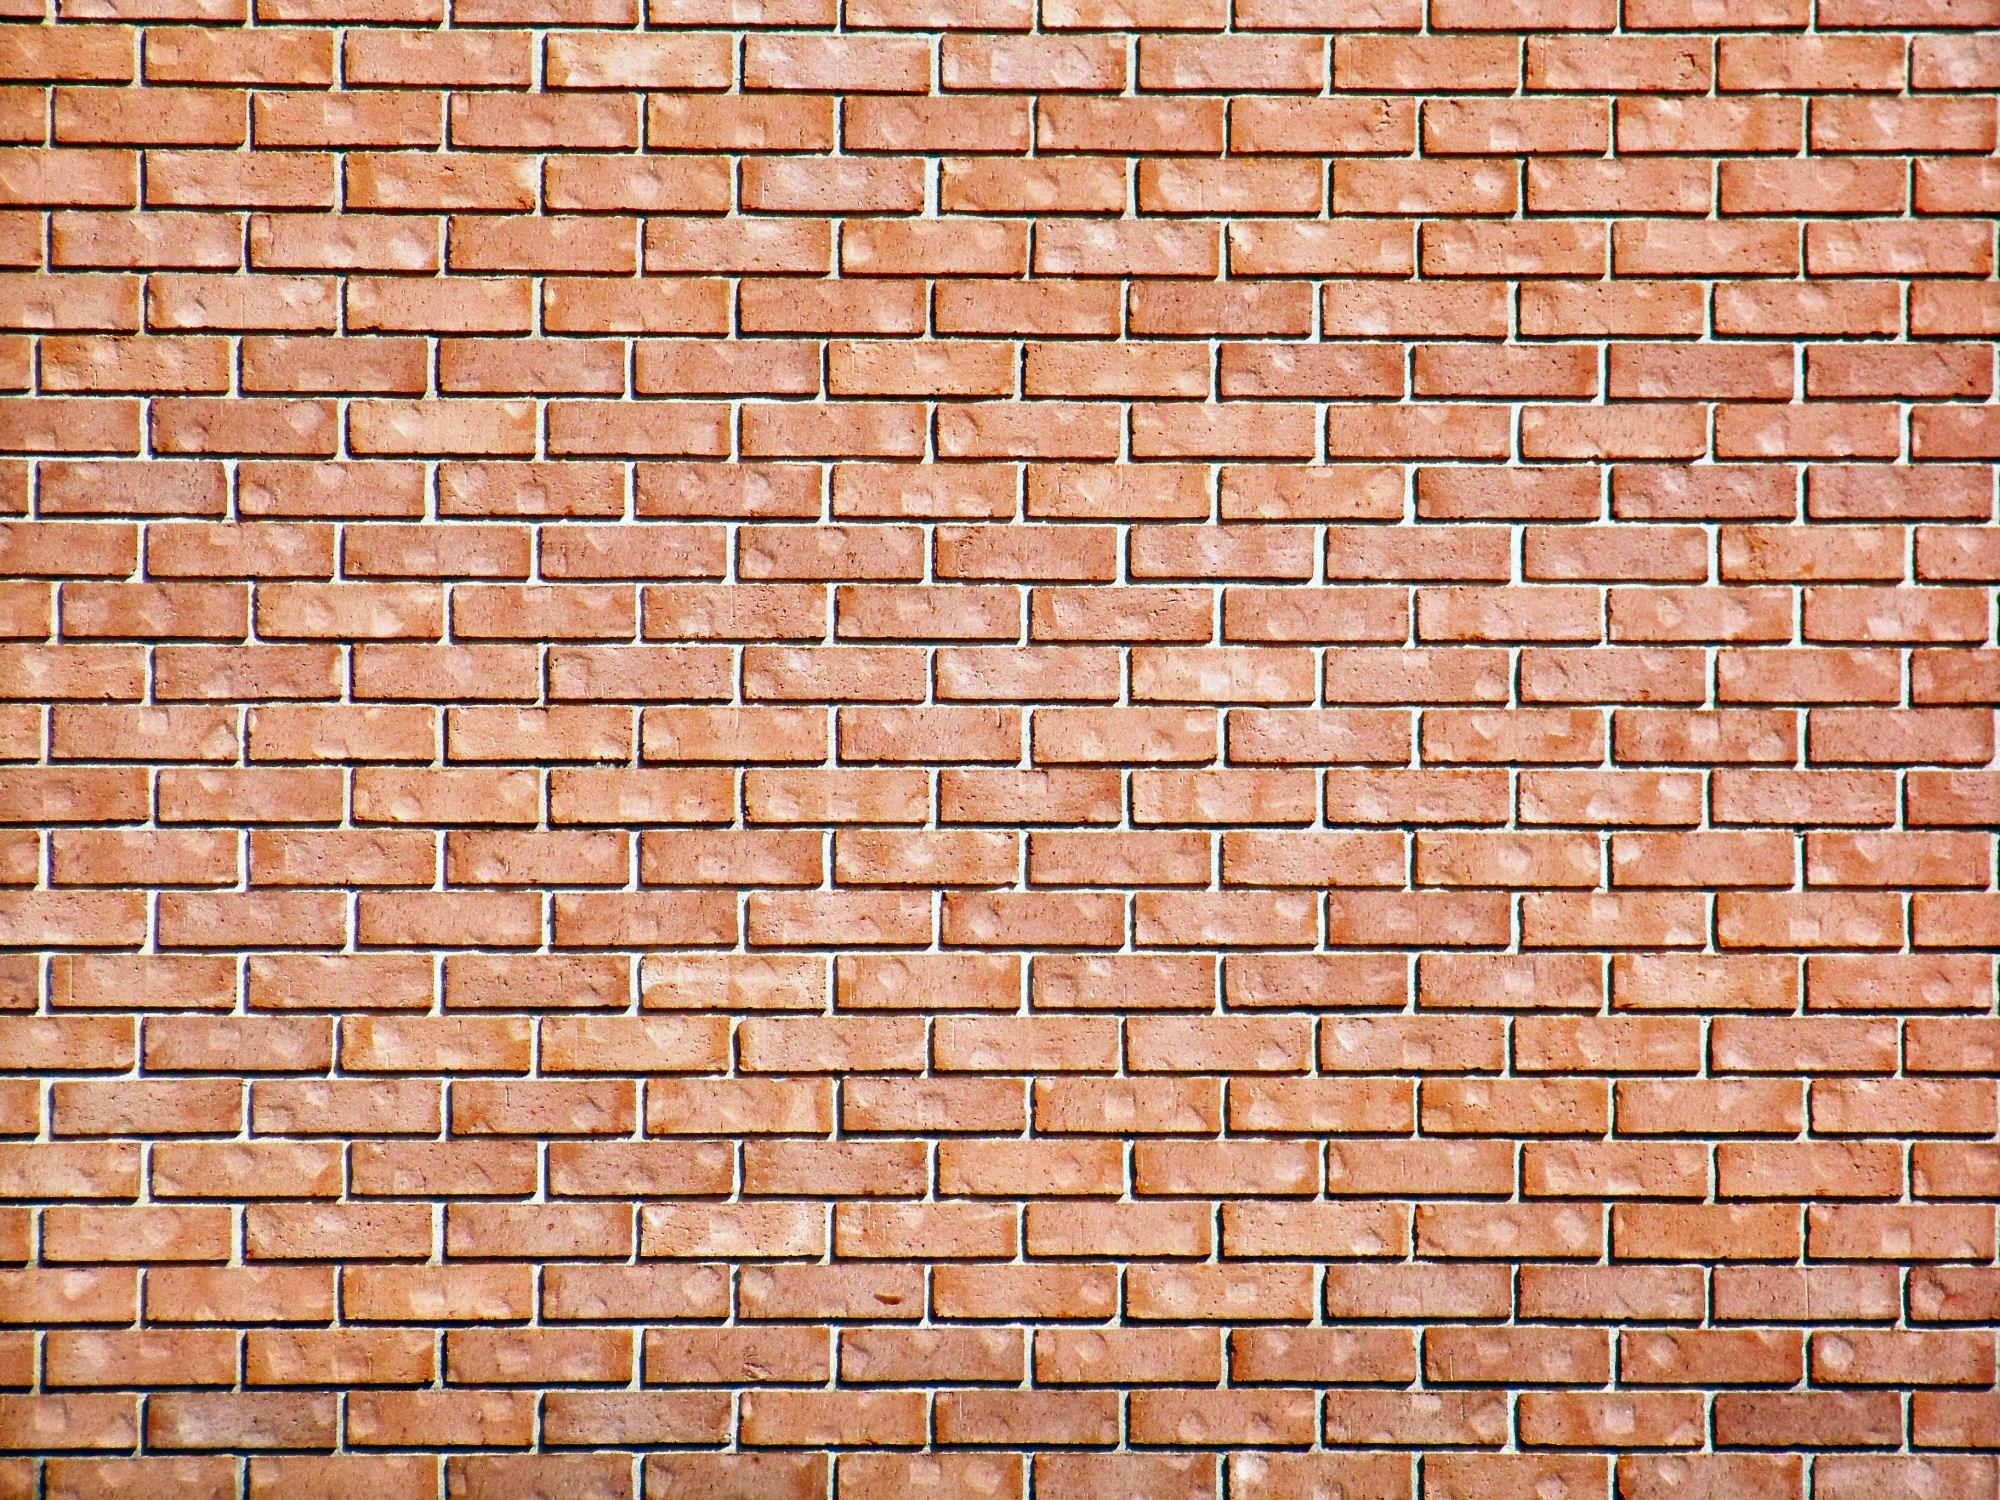 Hd brick wall clipart.